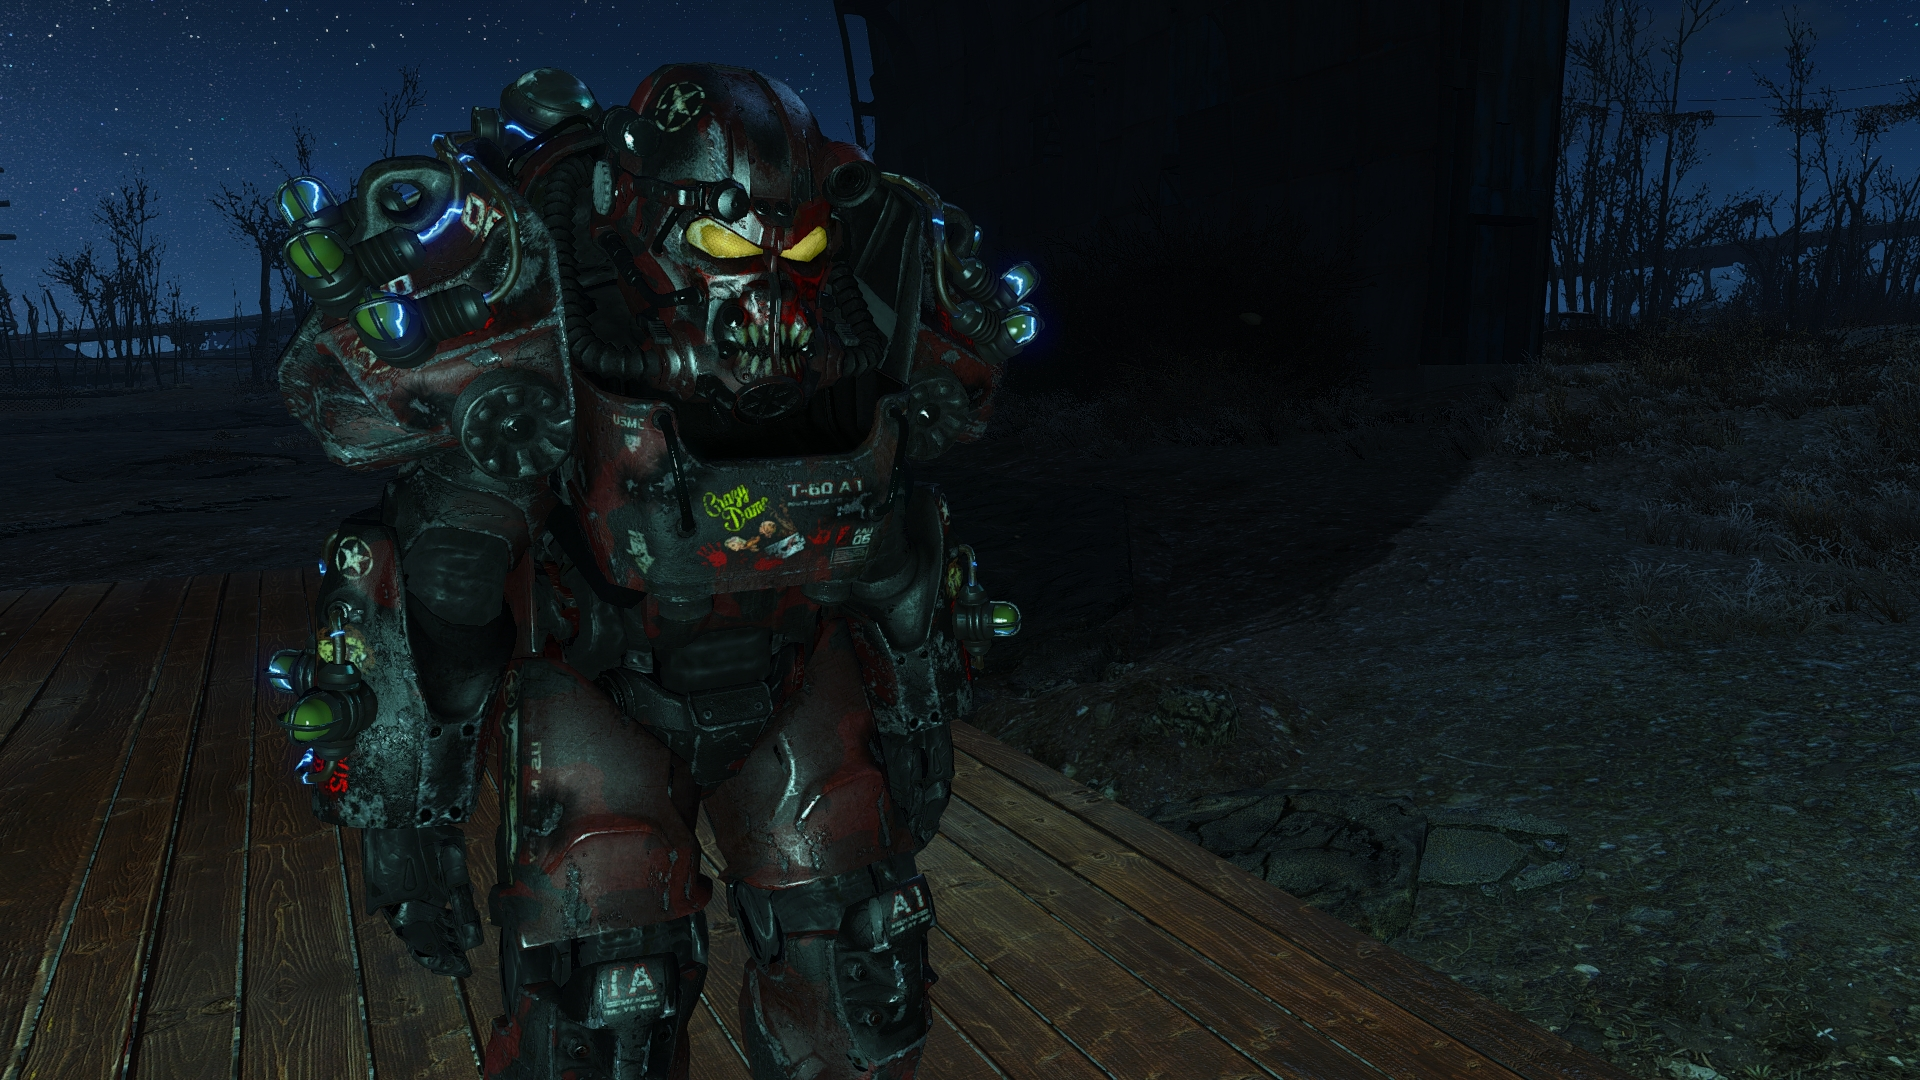 00014.Jpg - Fallout 4